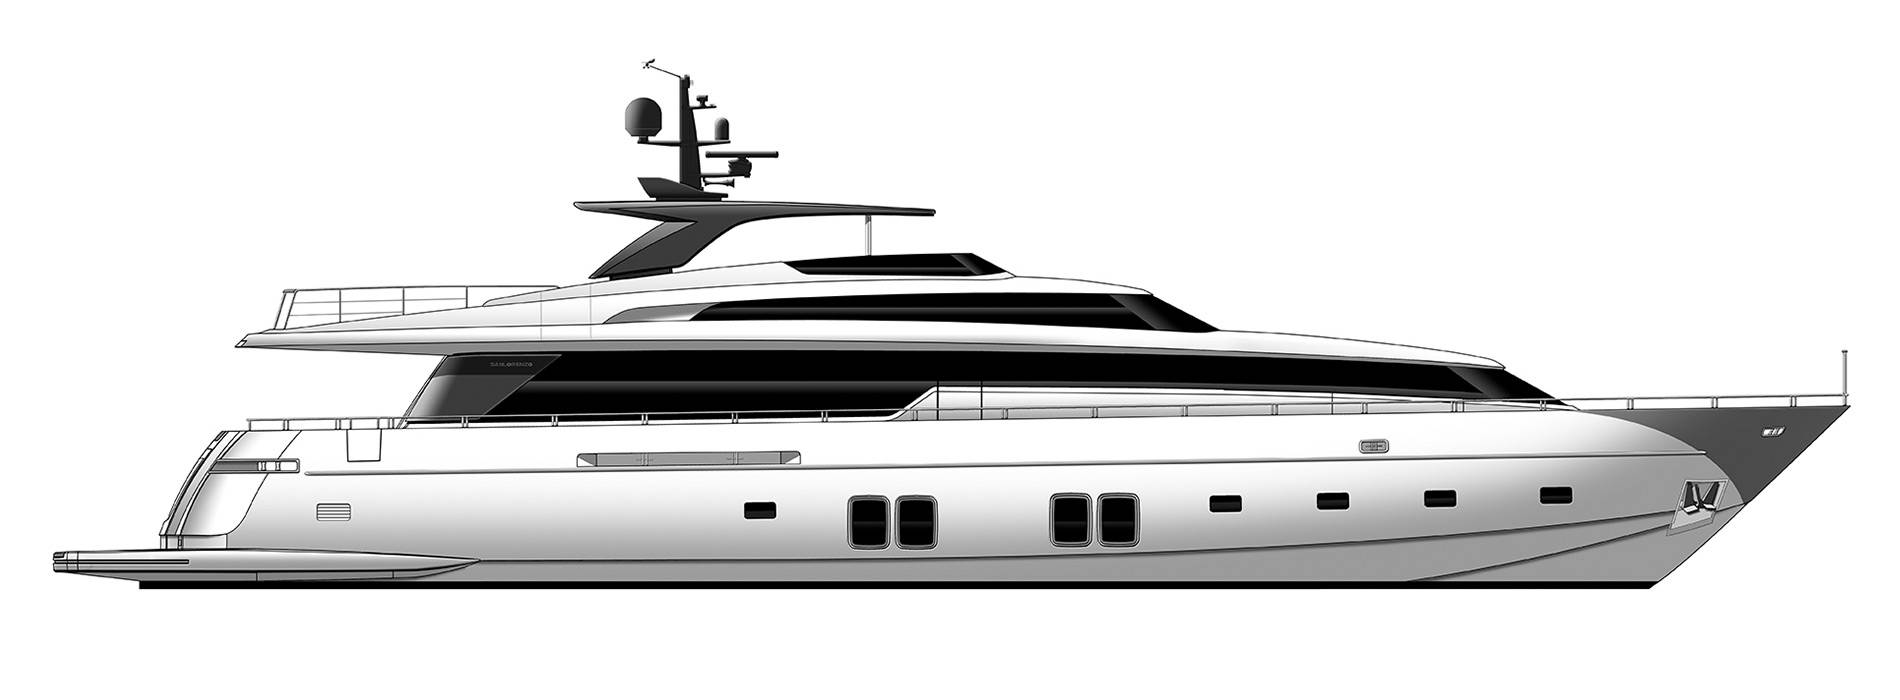 Sanlorenzo Yachts SL106 Profilo